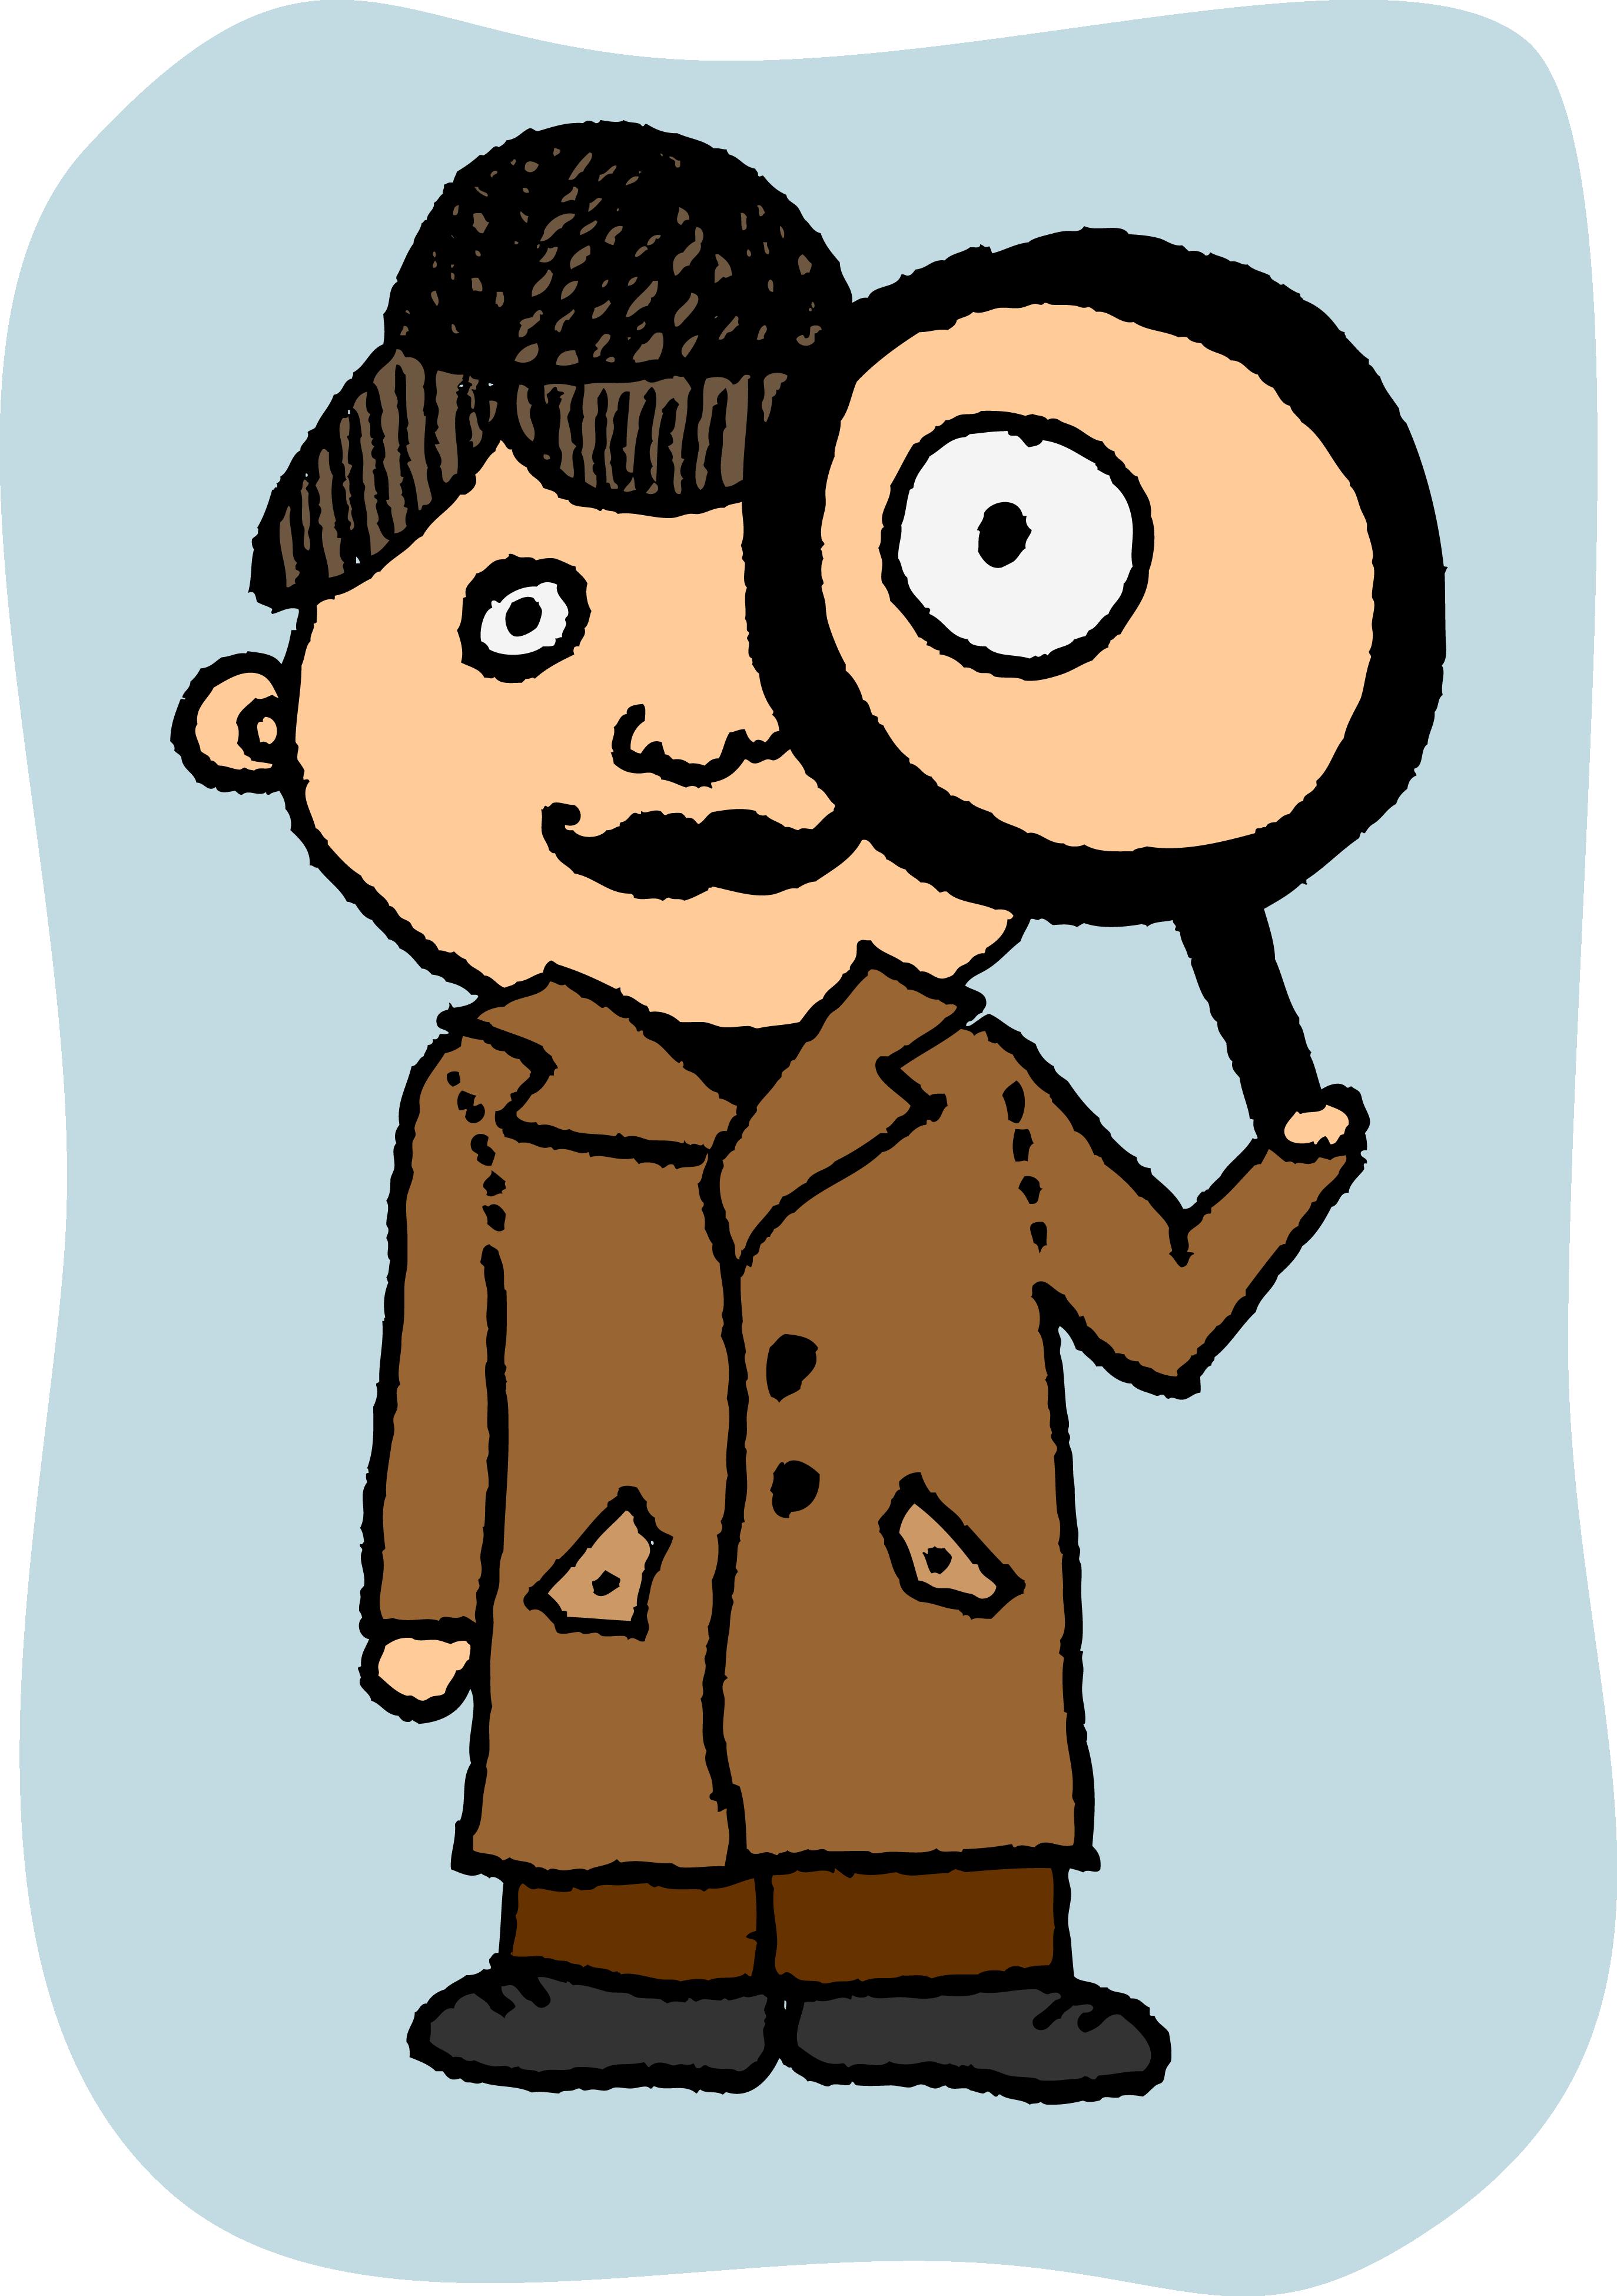 Improving Observation Skills | CCMIT